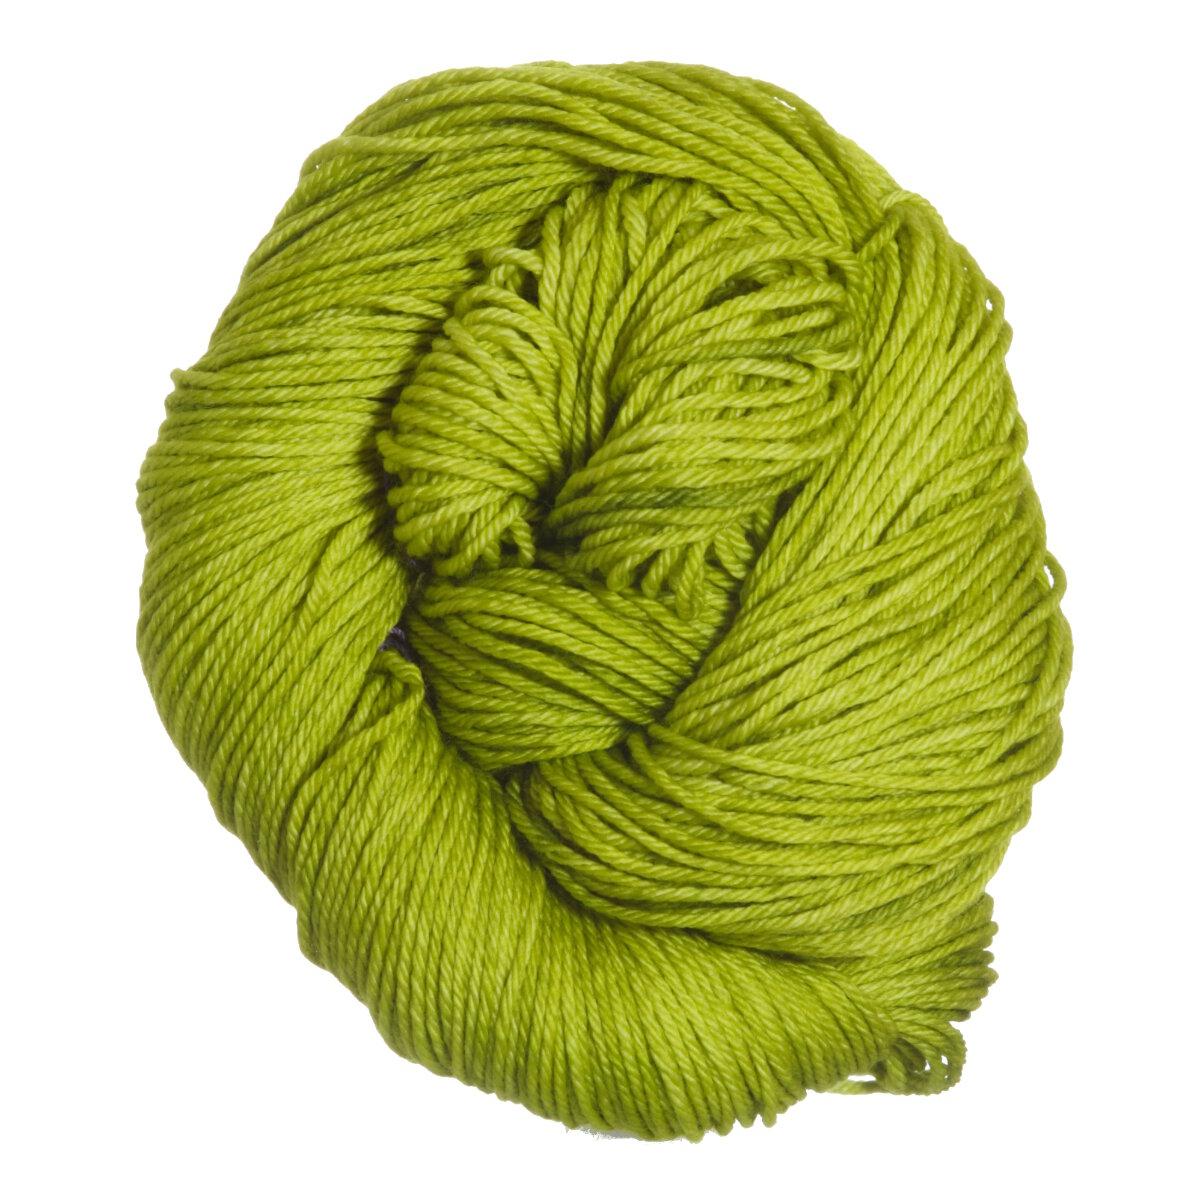 Madelinetosh Tosh DK Yarn - Grasshopper at Jimmy Beans Wool